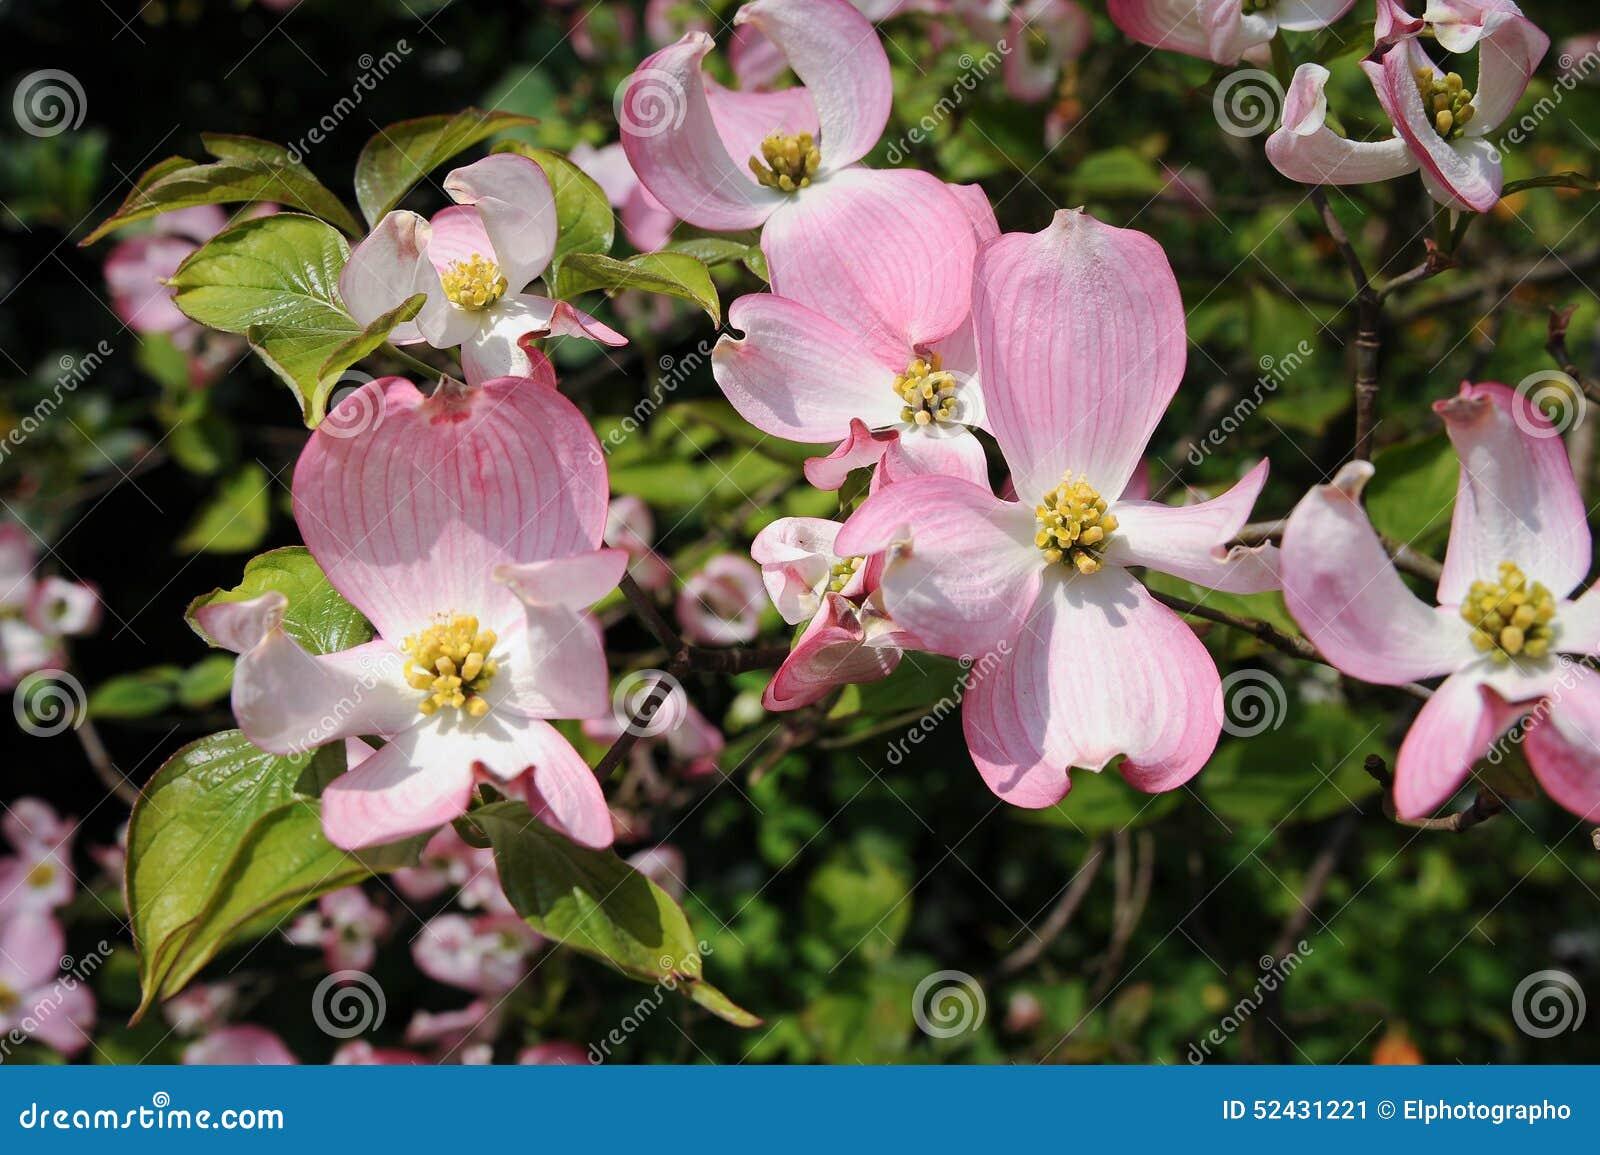 flowering dogwood cornus florida rubra pink flowers. Black Bedroom Furniture Sets. Home Design Ideas